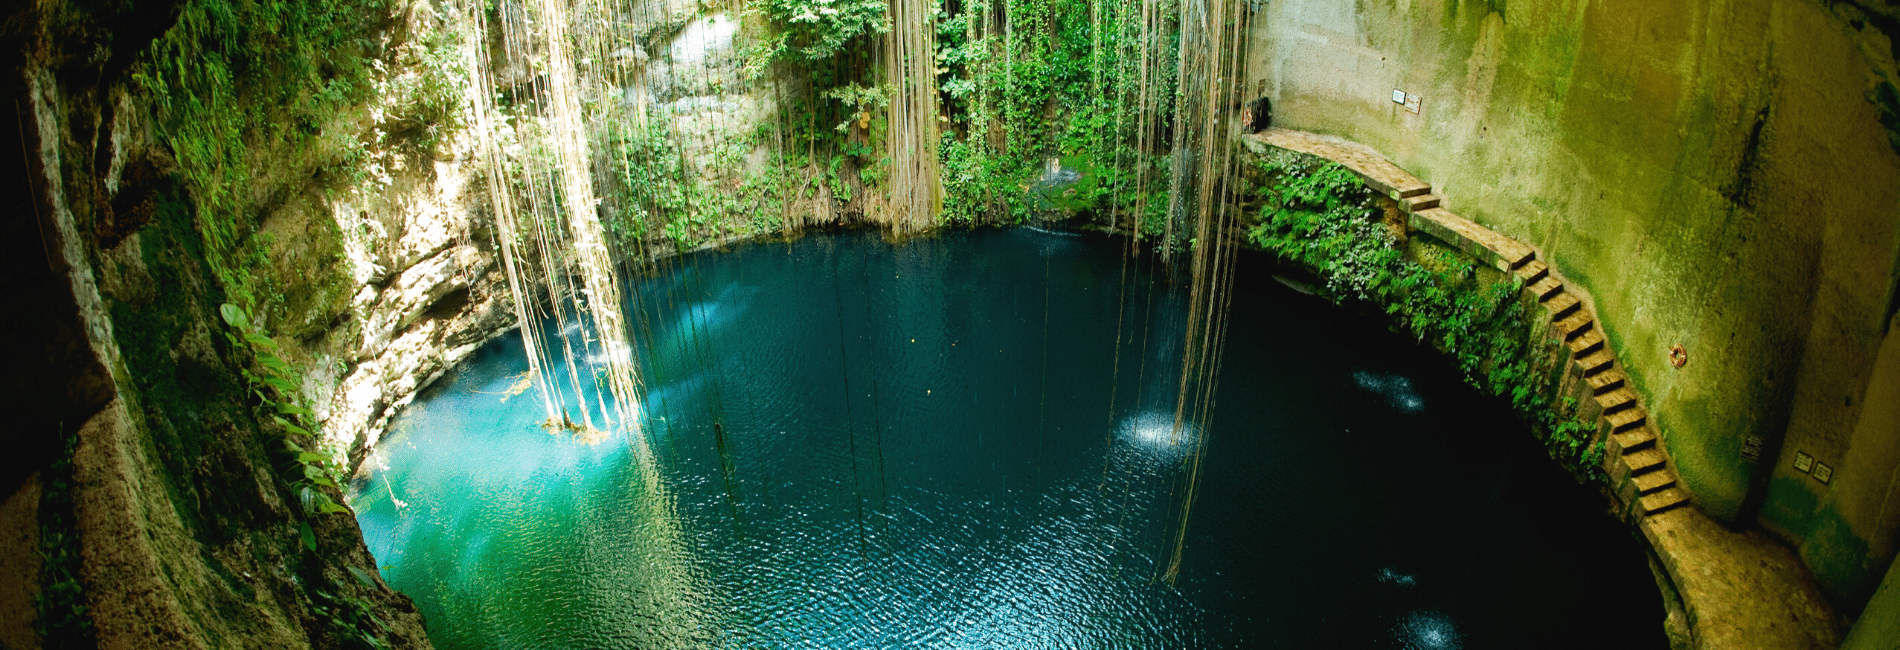 Best cenotes in yucatan. Best cenotes in Tulum.